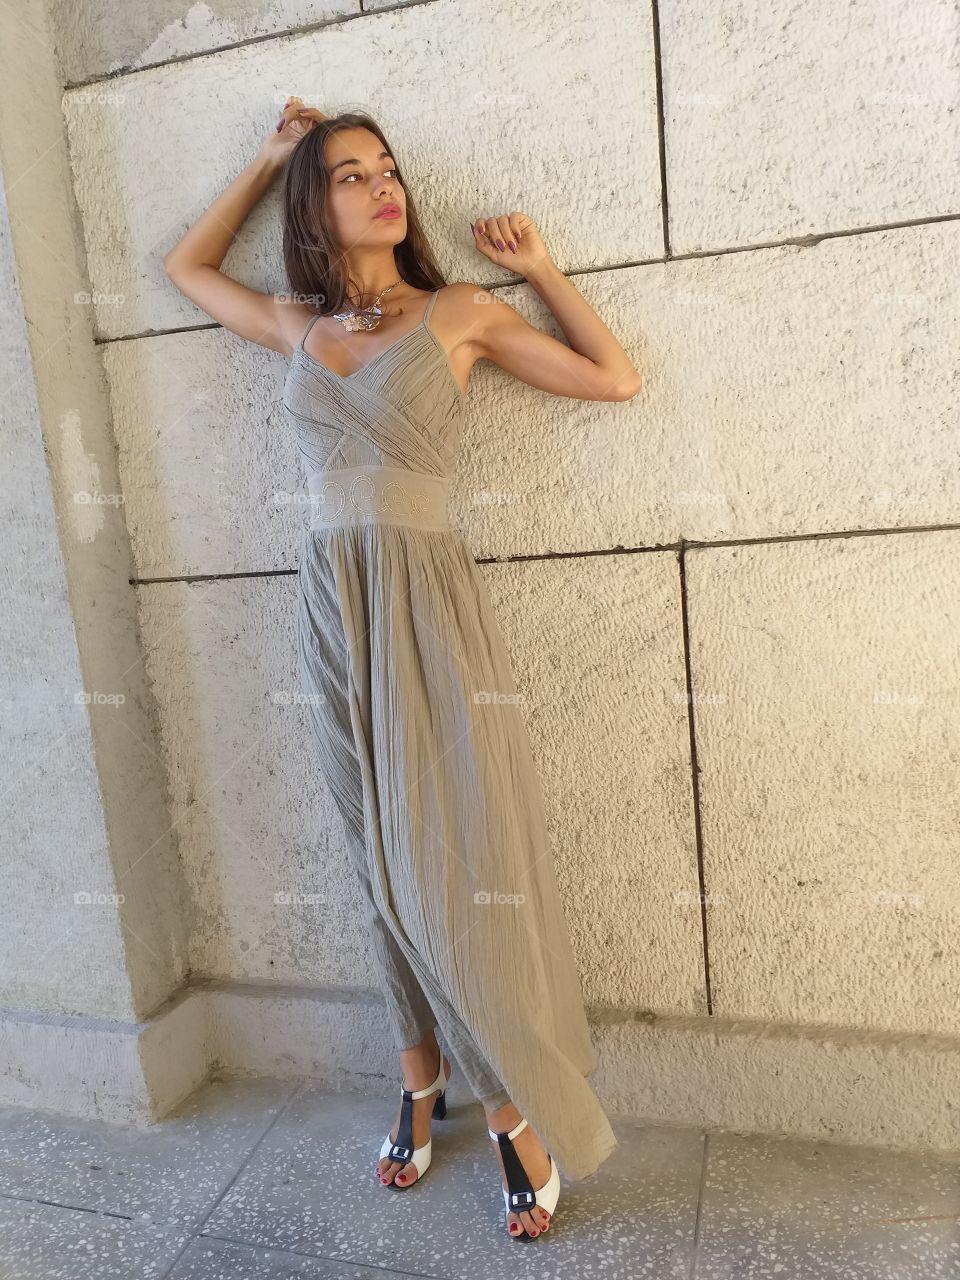 beautiful girl, model in long dress